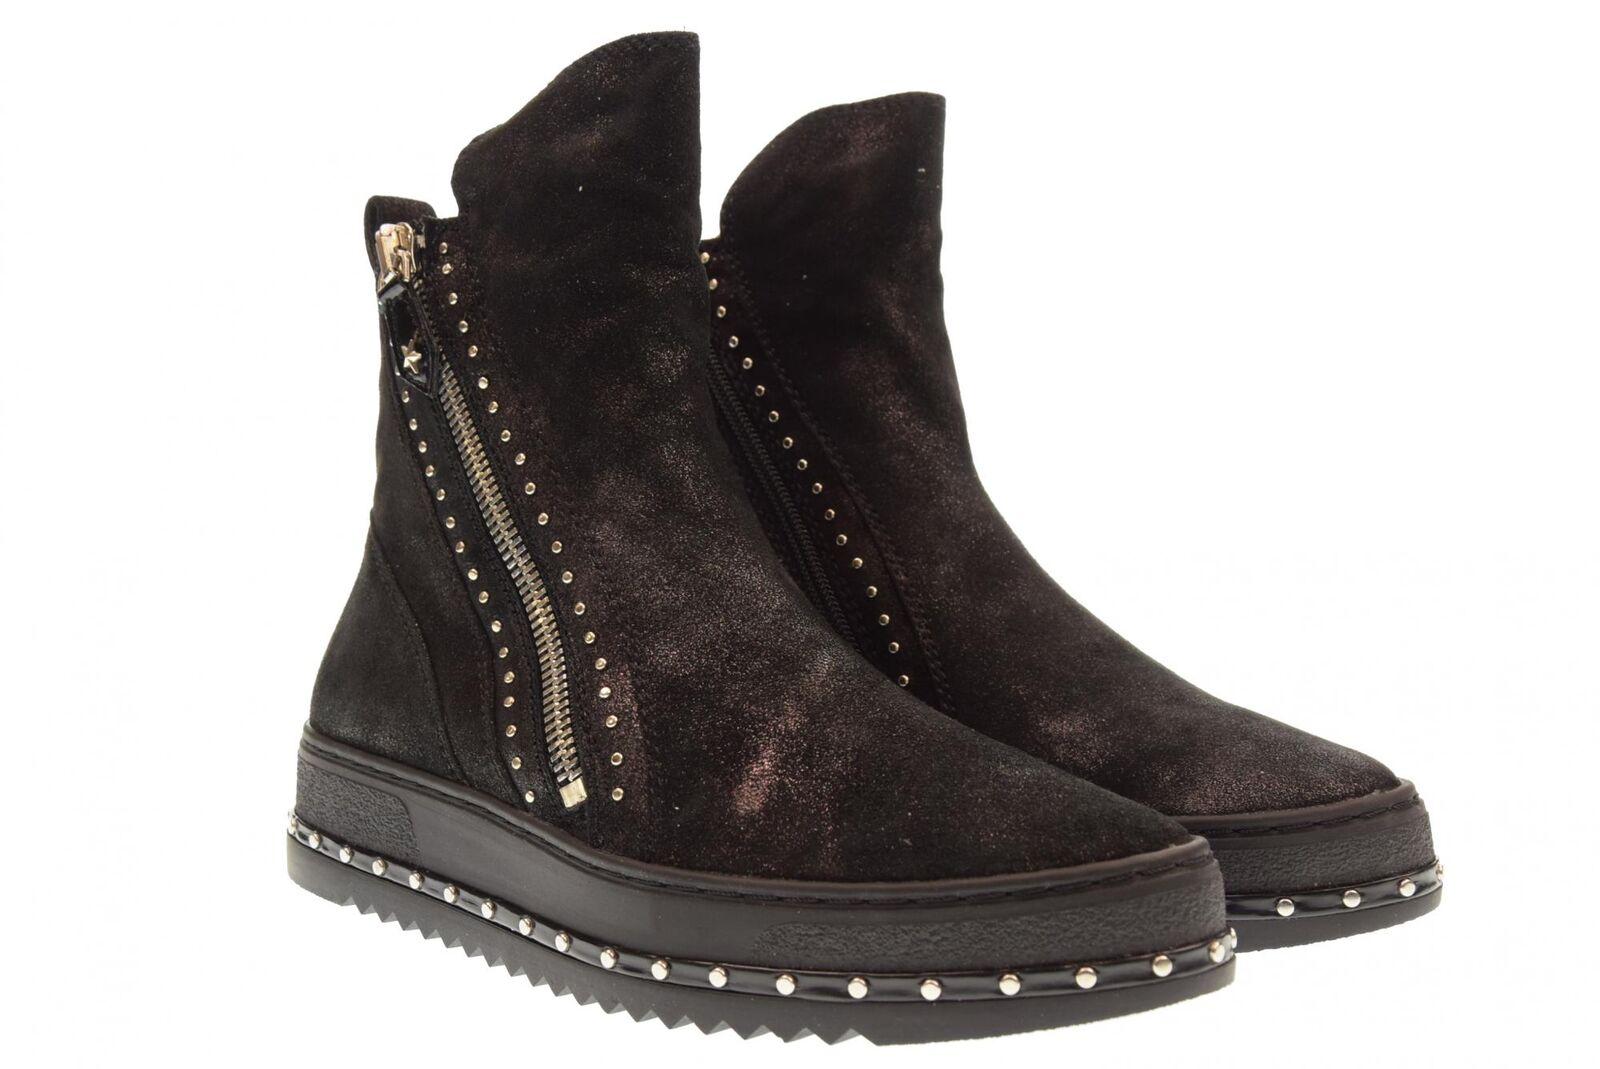 Altraofficina A18f chaussures femme bottines avec plateforme T1804X